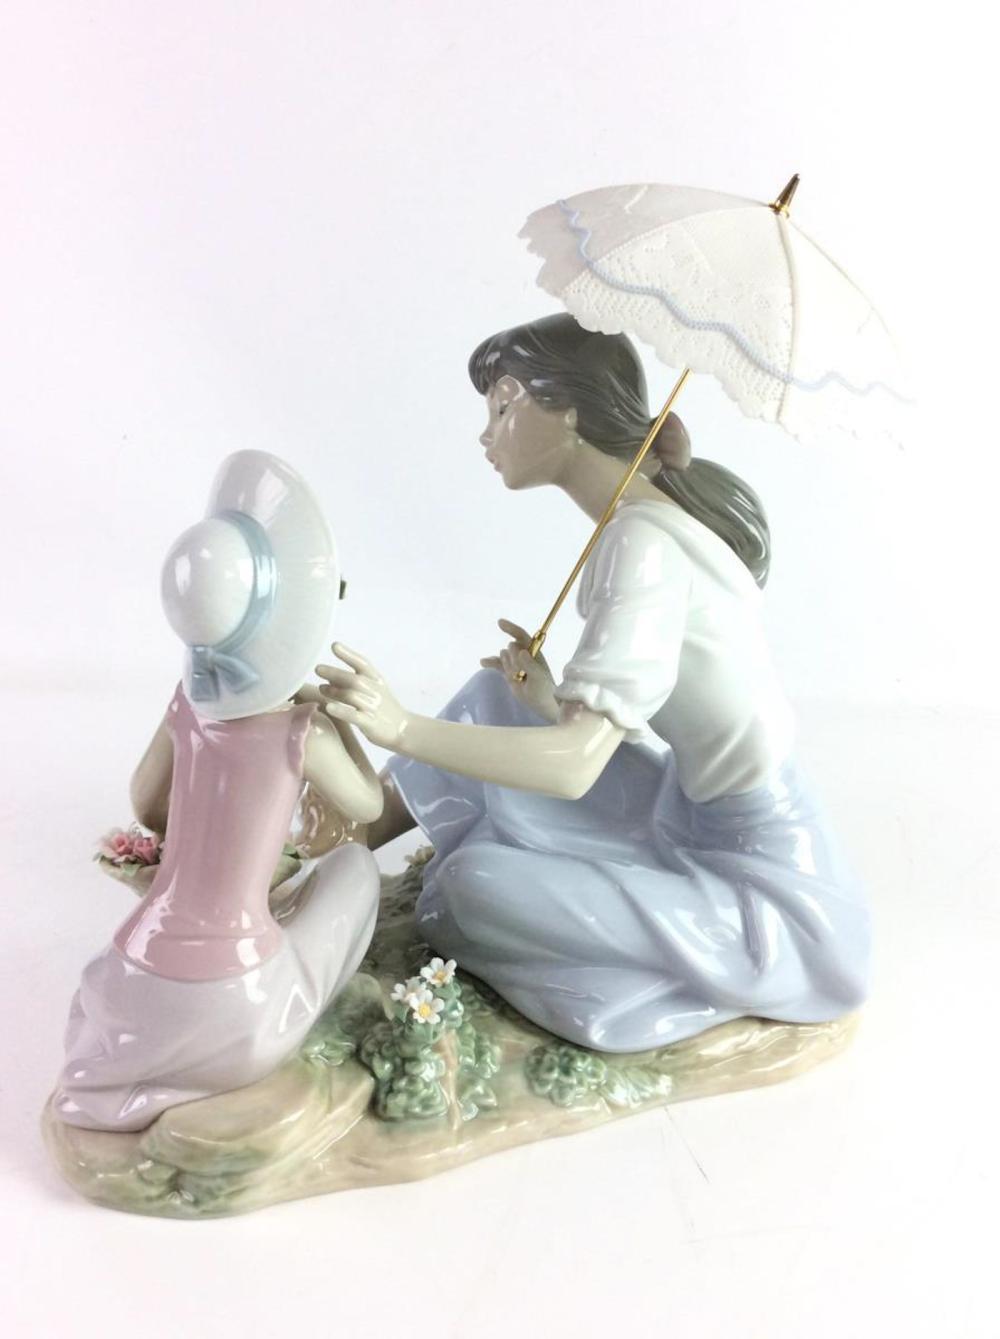 Lladro As Pretty As A Flower Figurine 6910